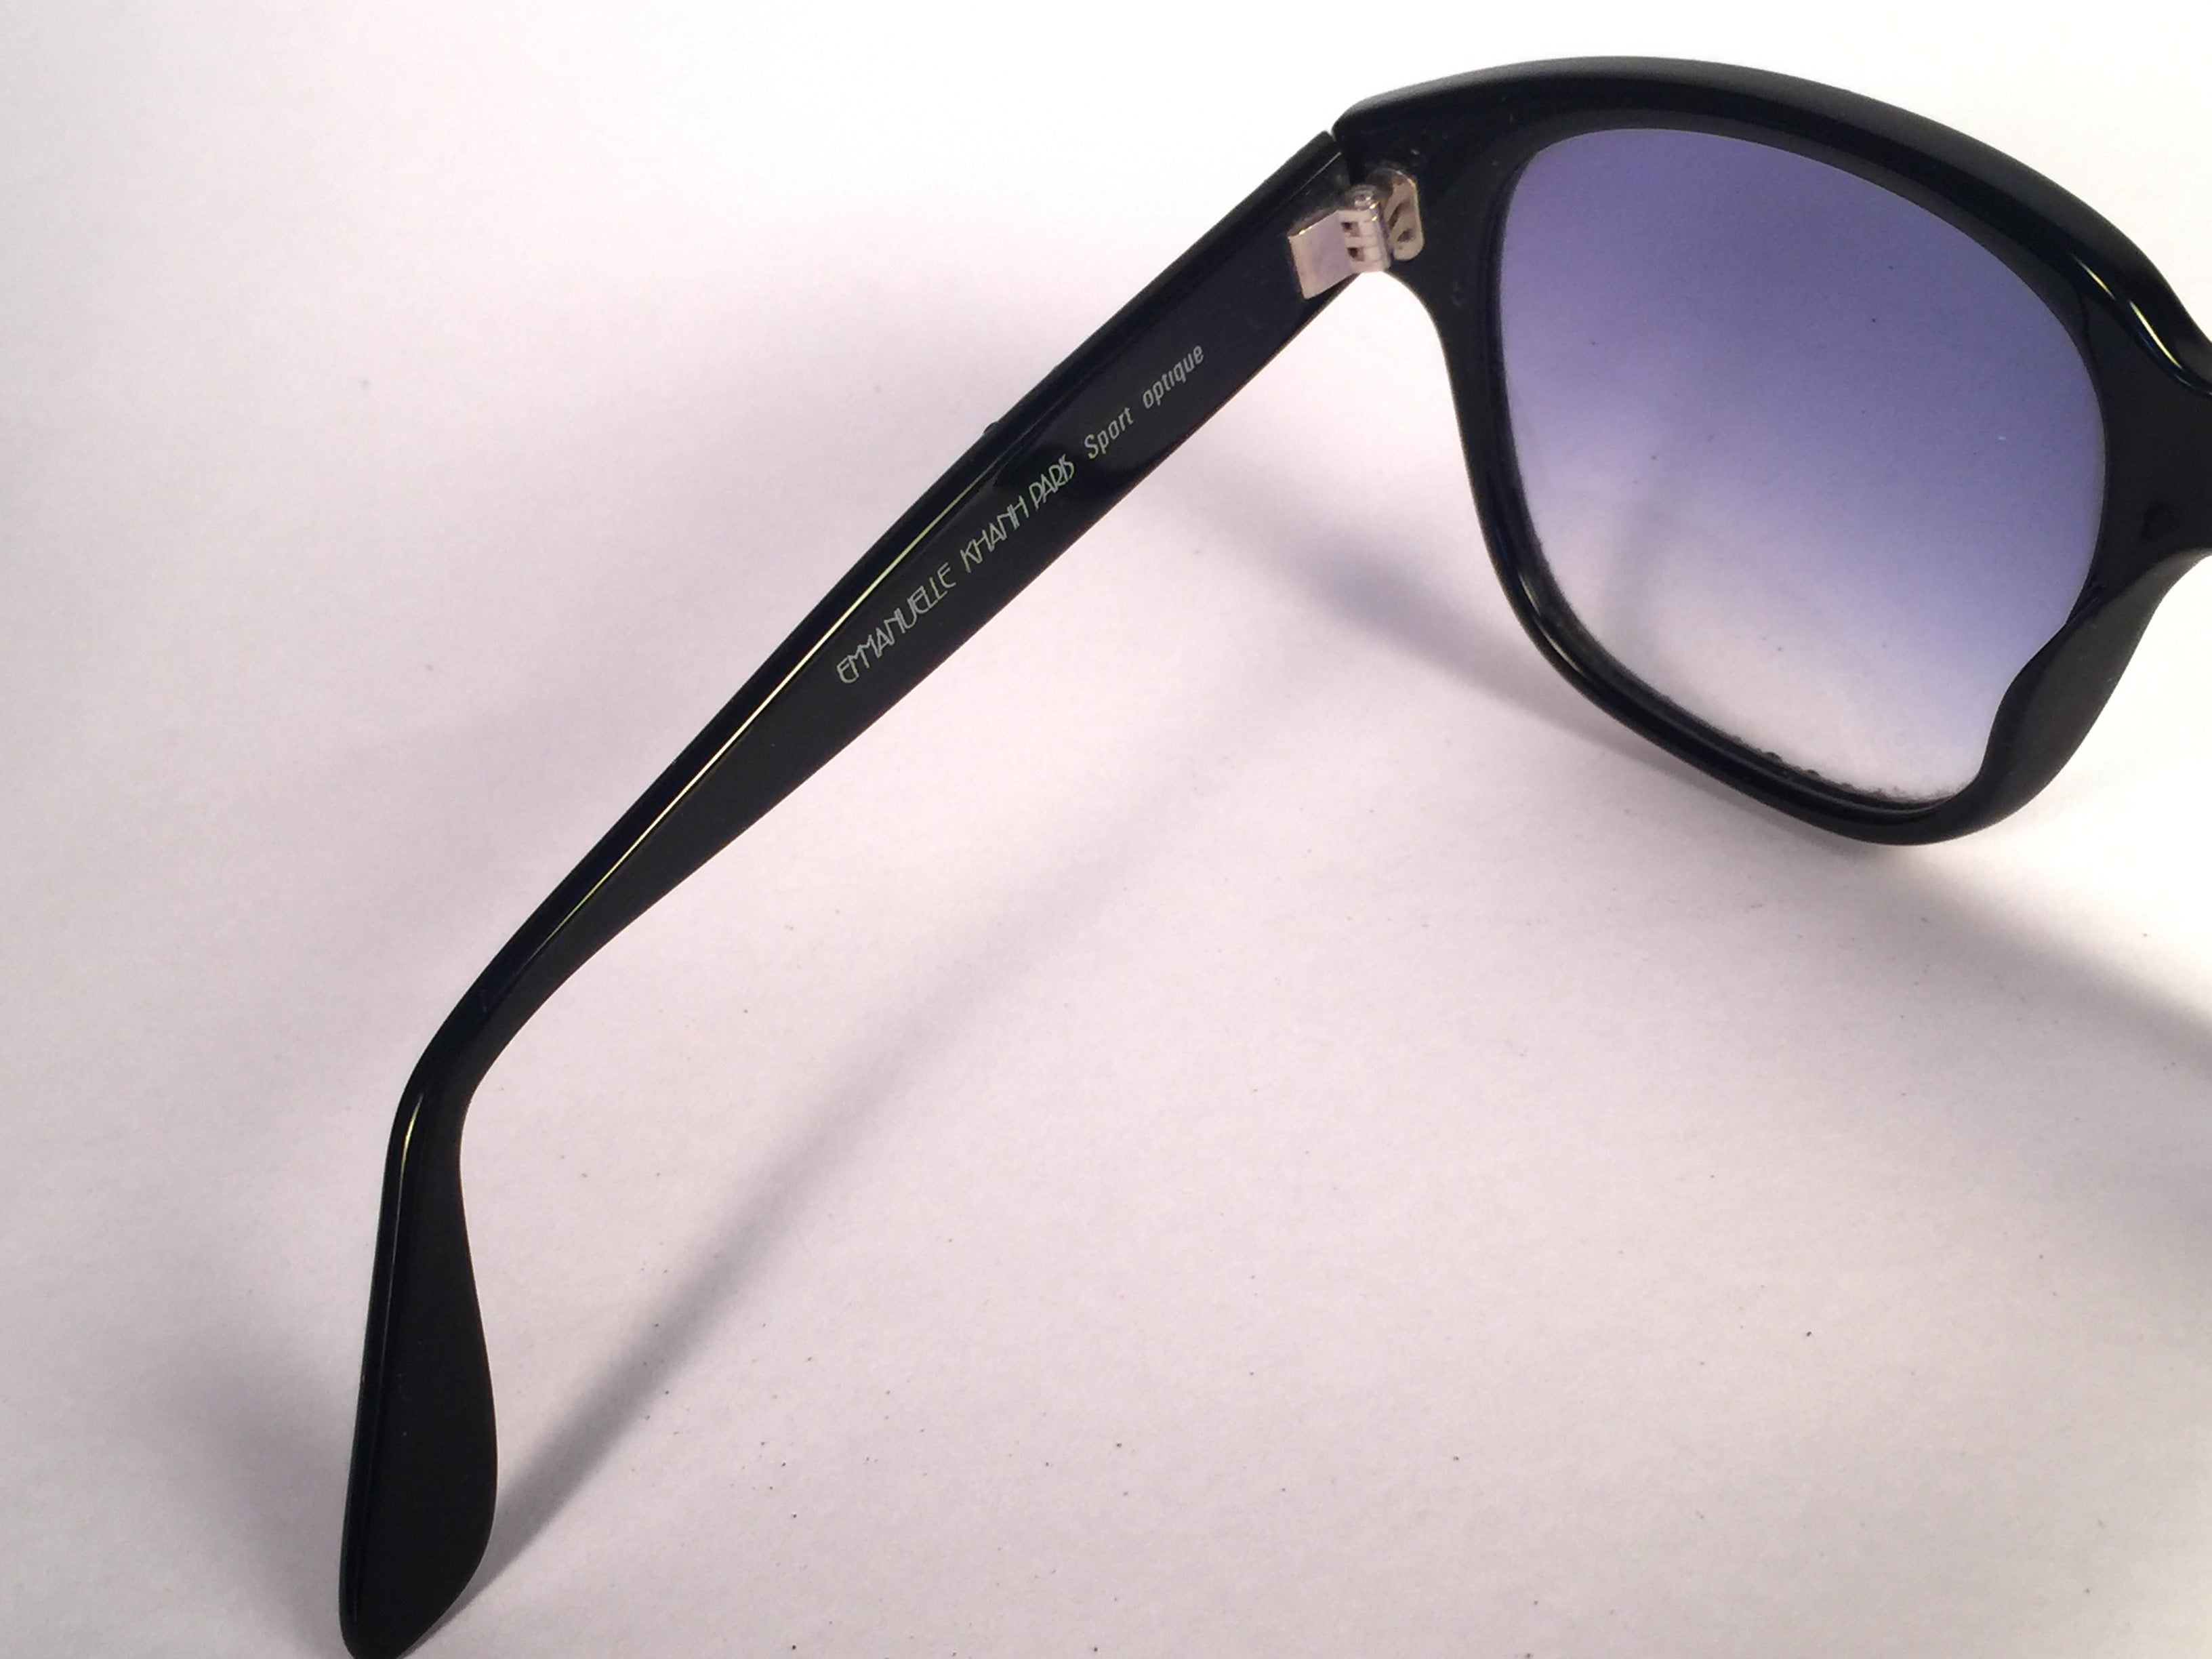 c78e3757987 New vintage emanuelle kahn paris rhinestones accents black sunglasses  france at stdibs jpg 3264x2448 Emmanuel kahn